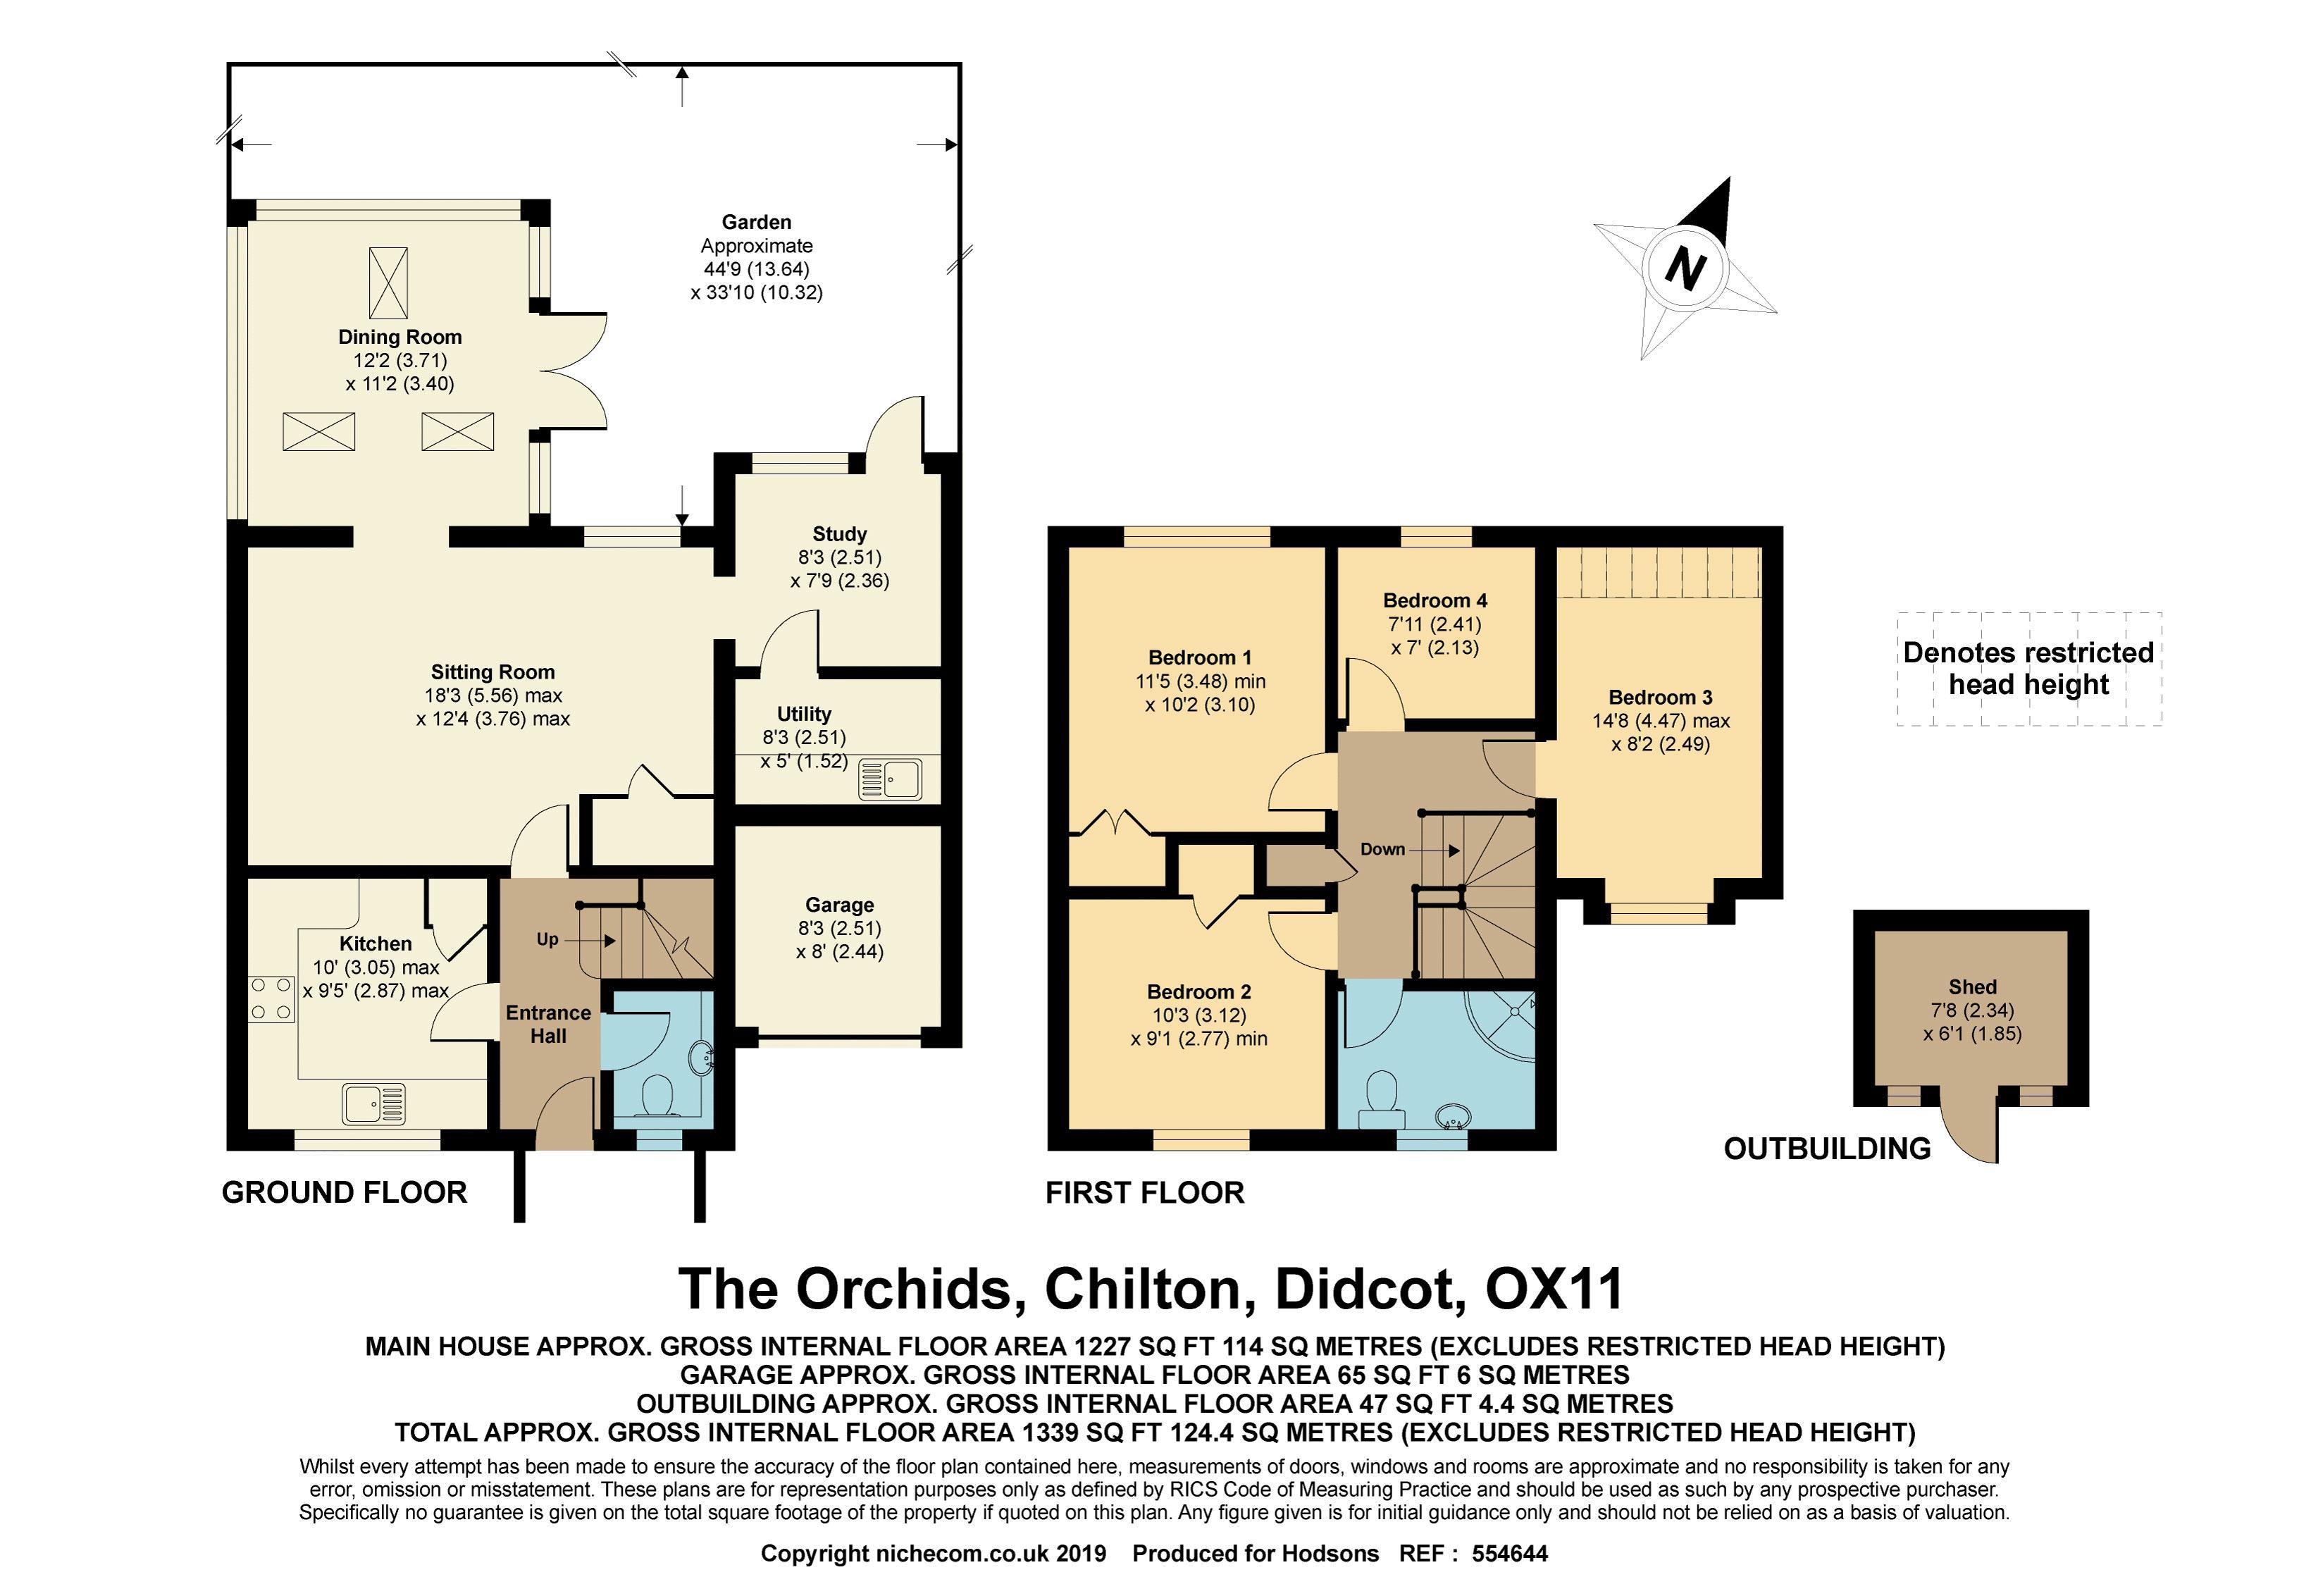 The Orchids Chilton